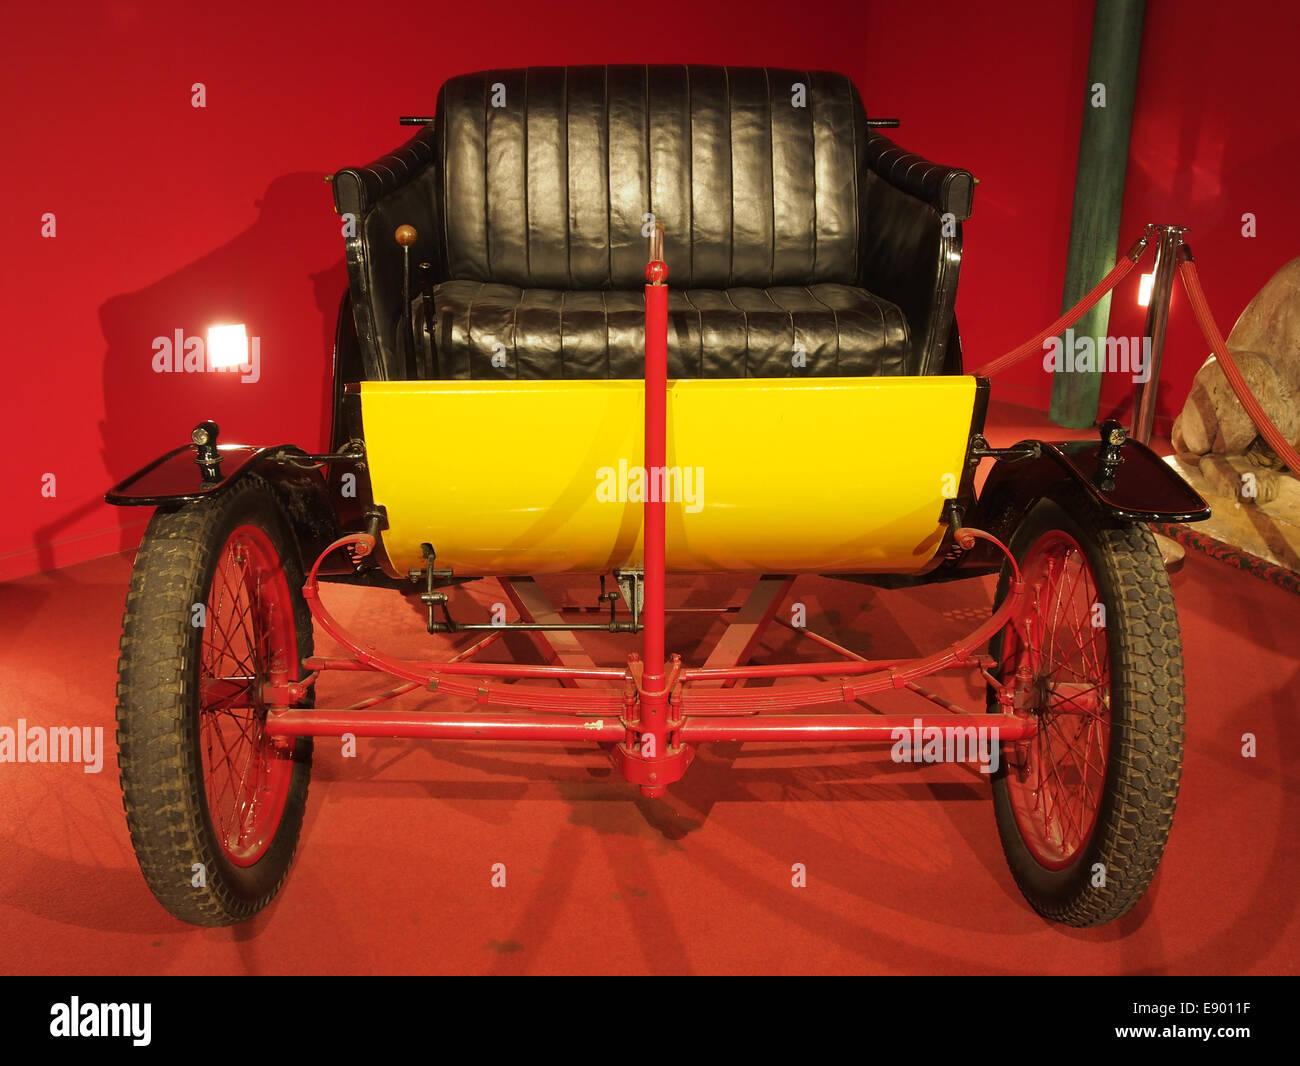 bugatti phac3abton twoseater 1 2cv used by ettore bugatti to move